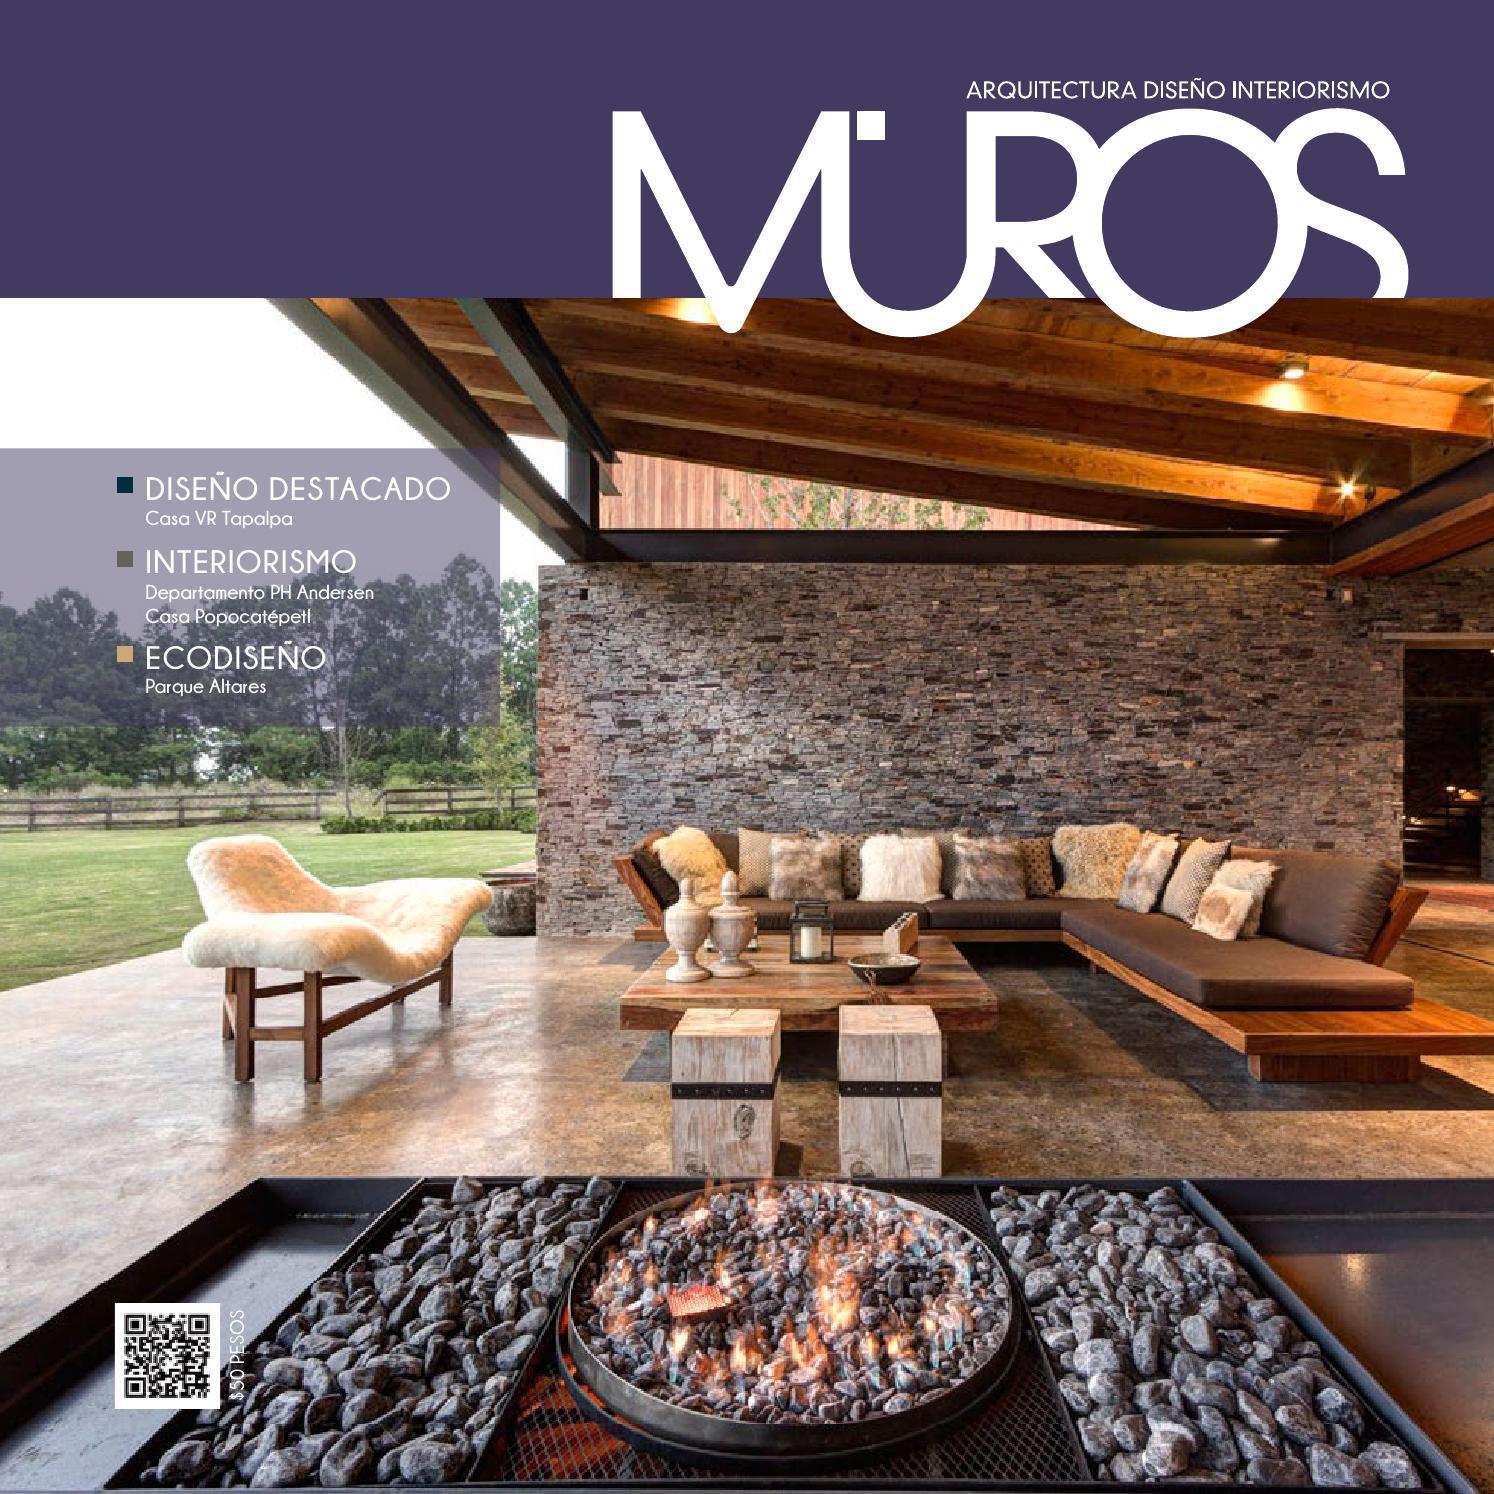 Edici n 20 revista muros arquitectura dise o for Articulos de arquitectura 2015